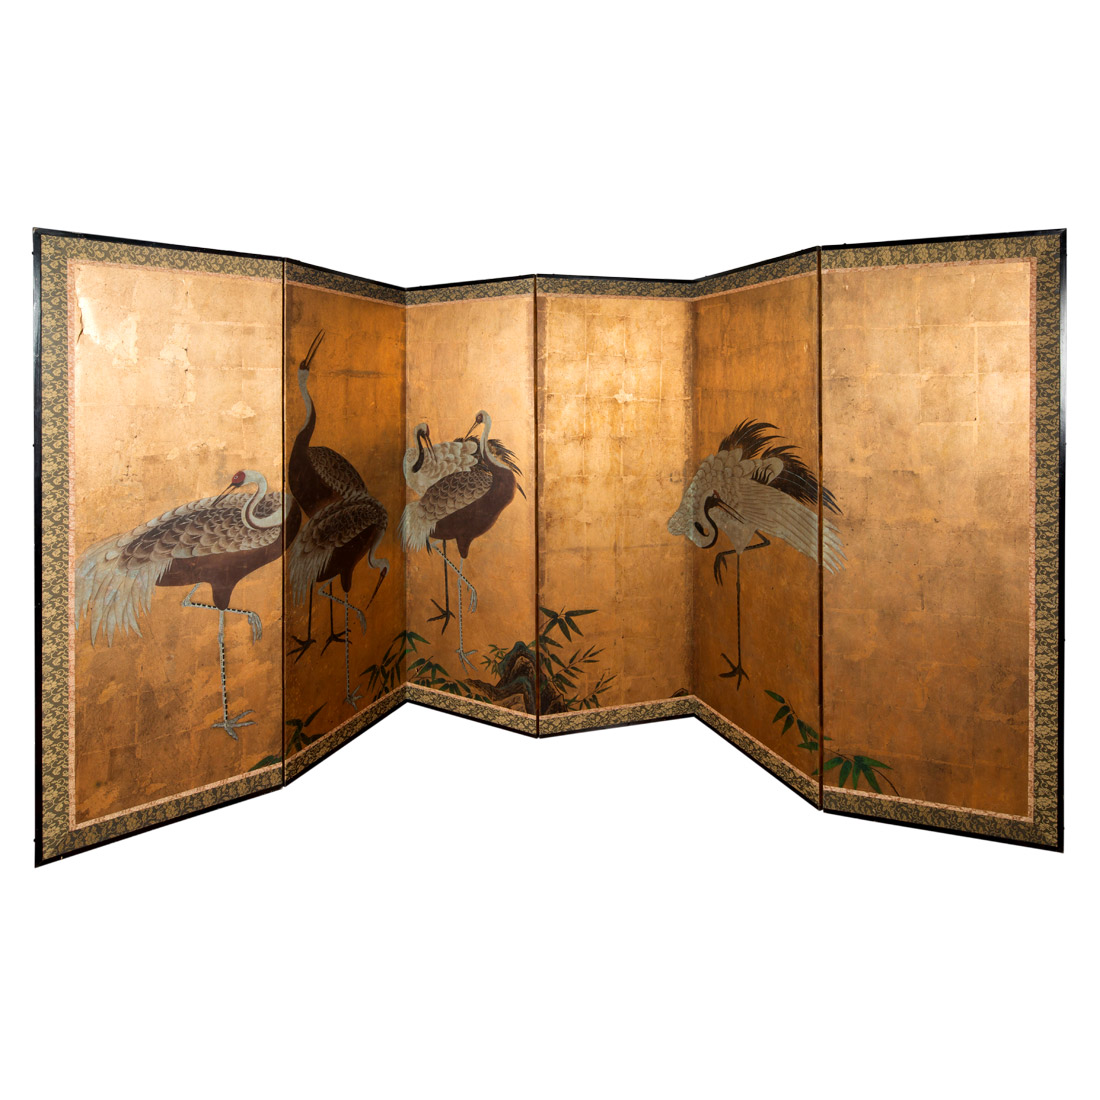 19th Century Japanese 6 fold screen